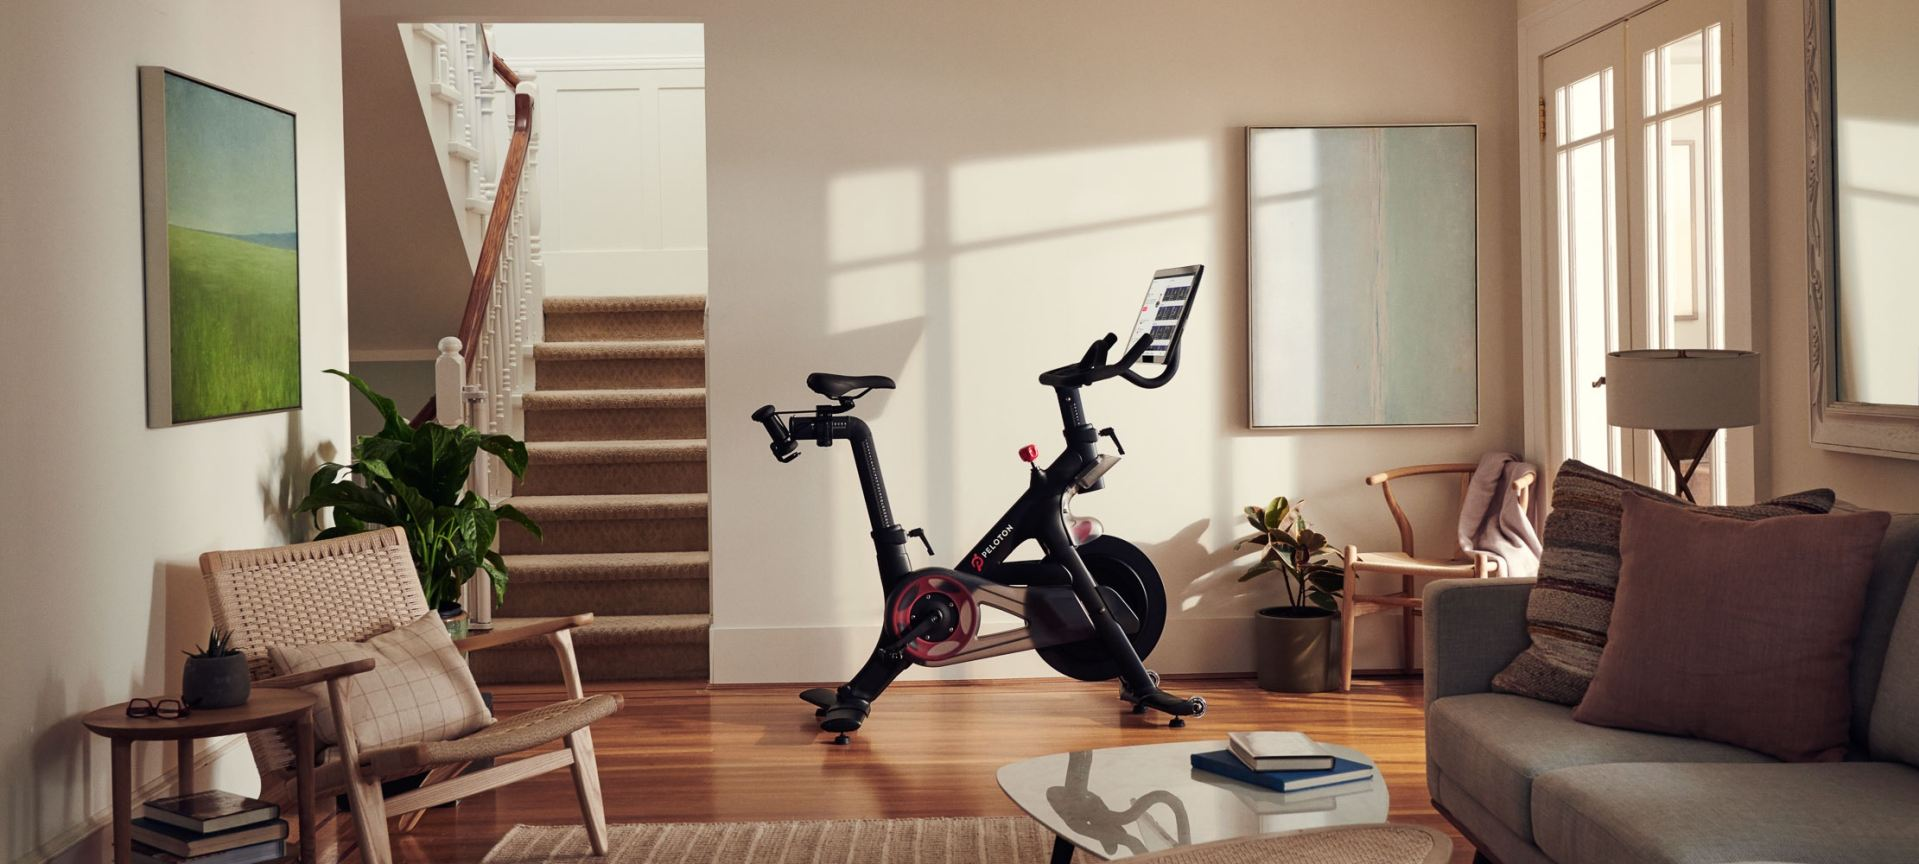 bike-wide-living-room-001-2-2136